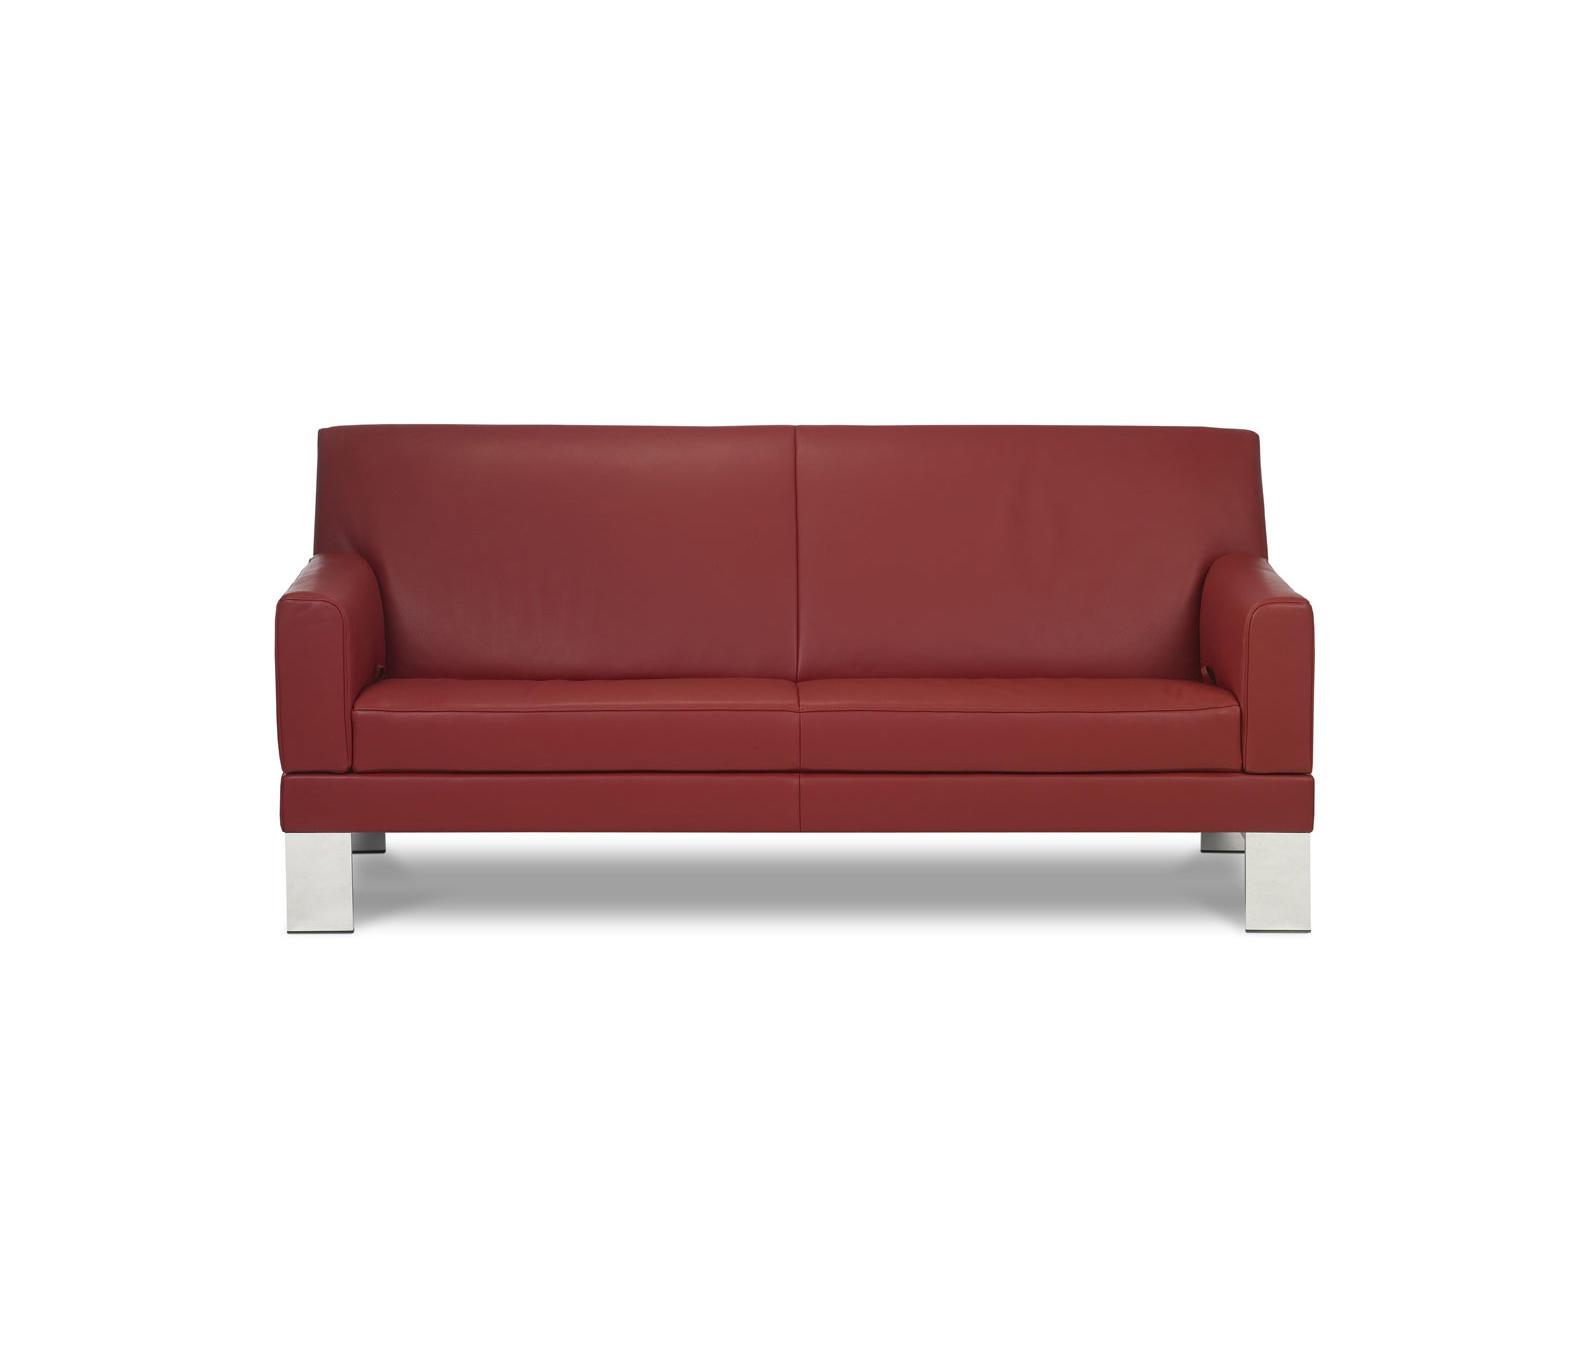 GLOVE SOFA - Lounge sofas from Jori | Architonic